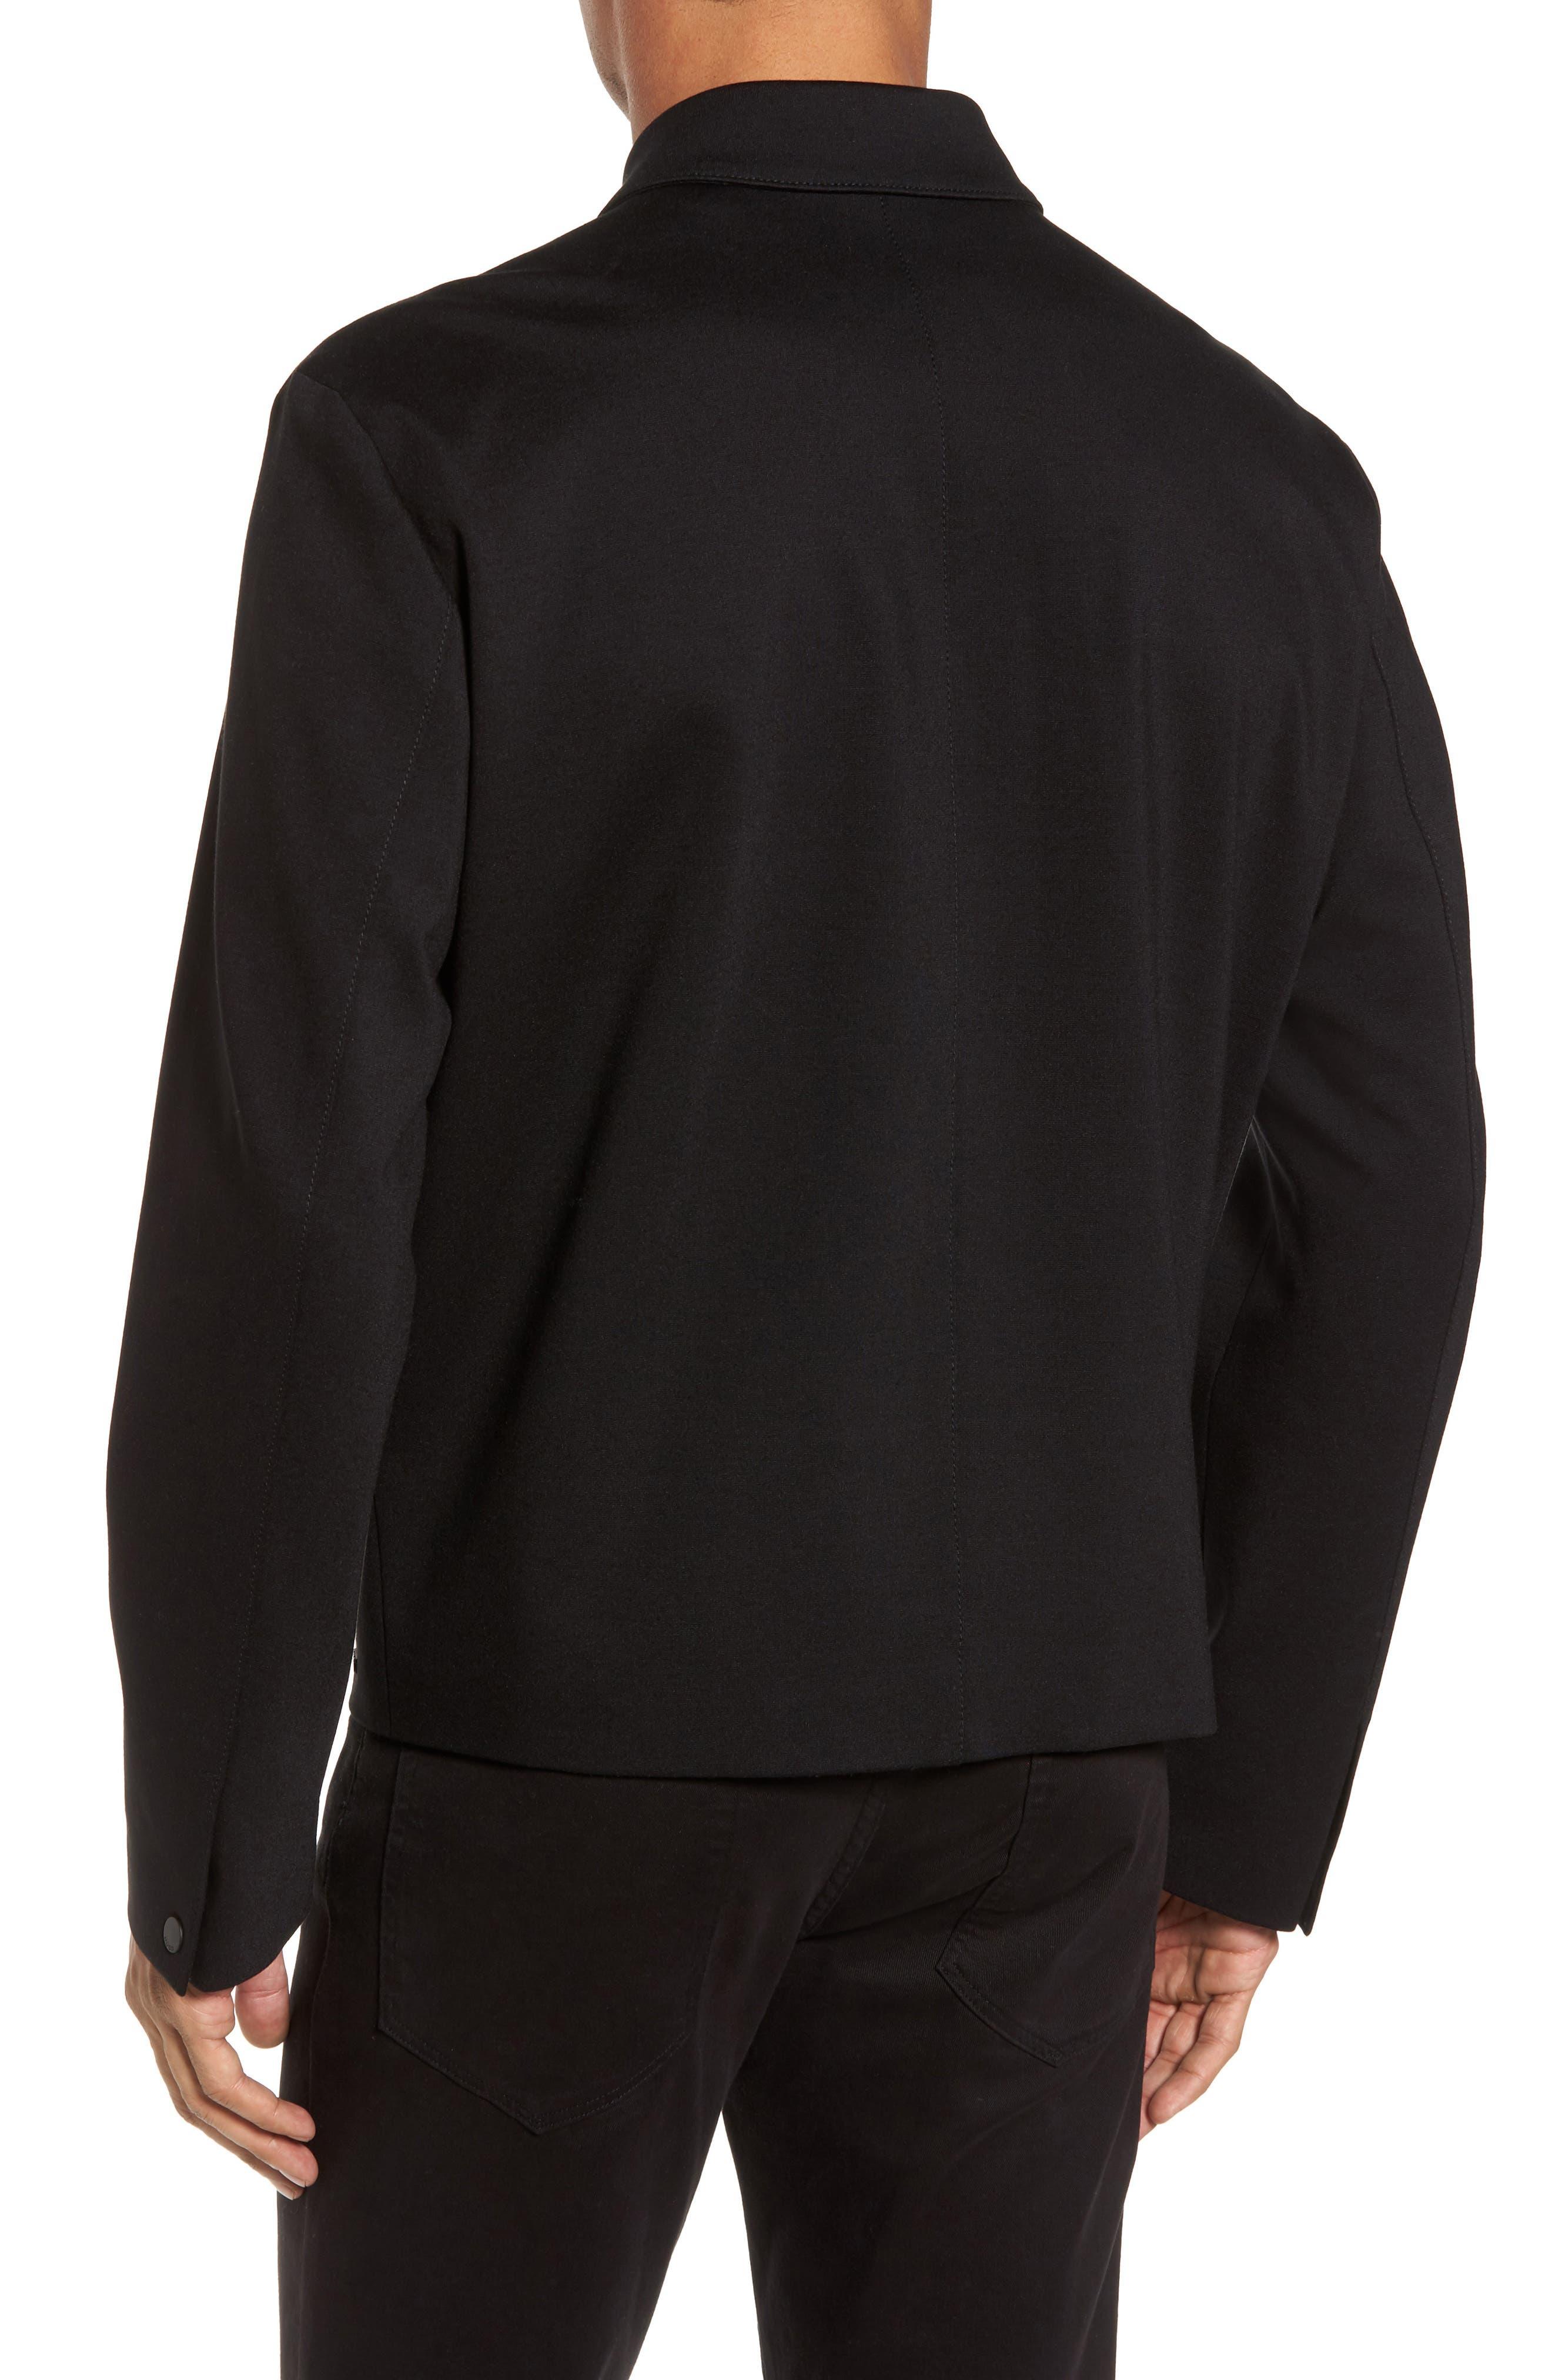 Hugo Boss Babenu Shirt Jacket,                             Alternate thumbnail 2, color,